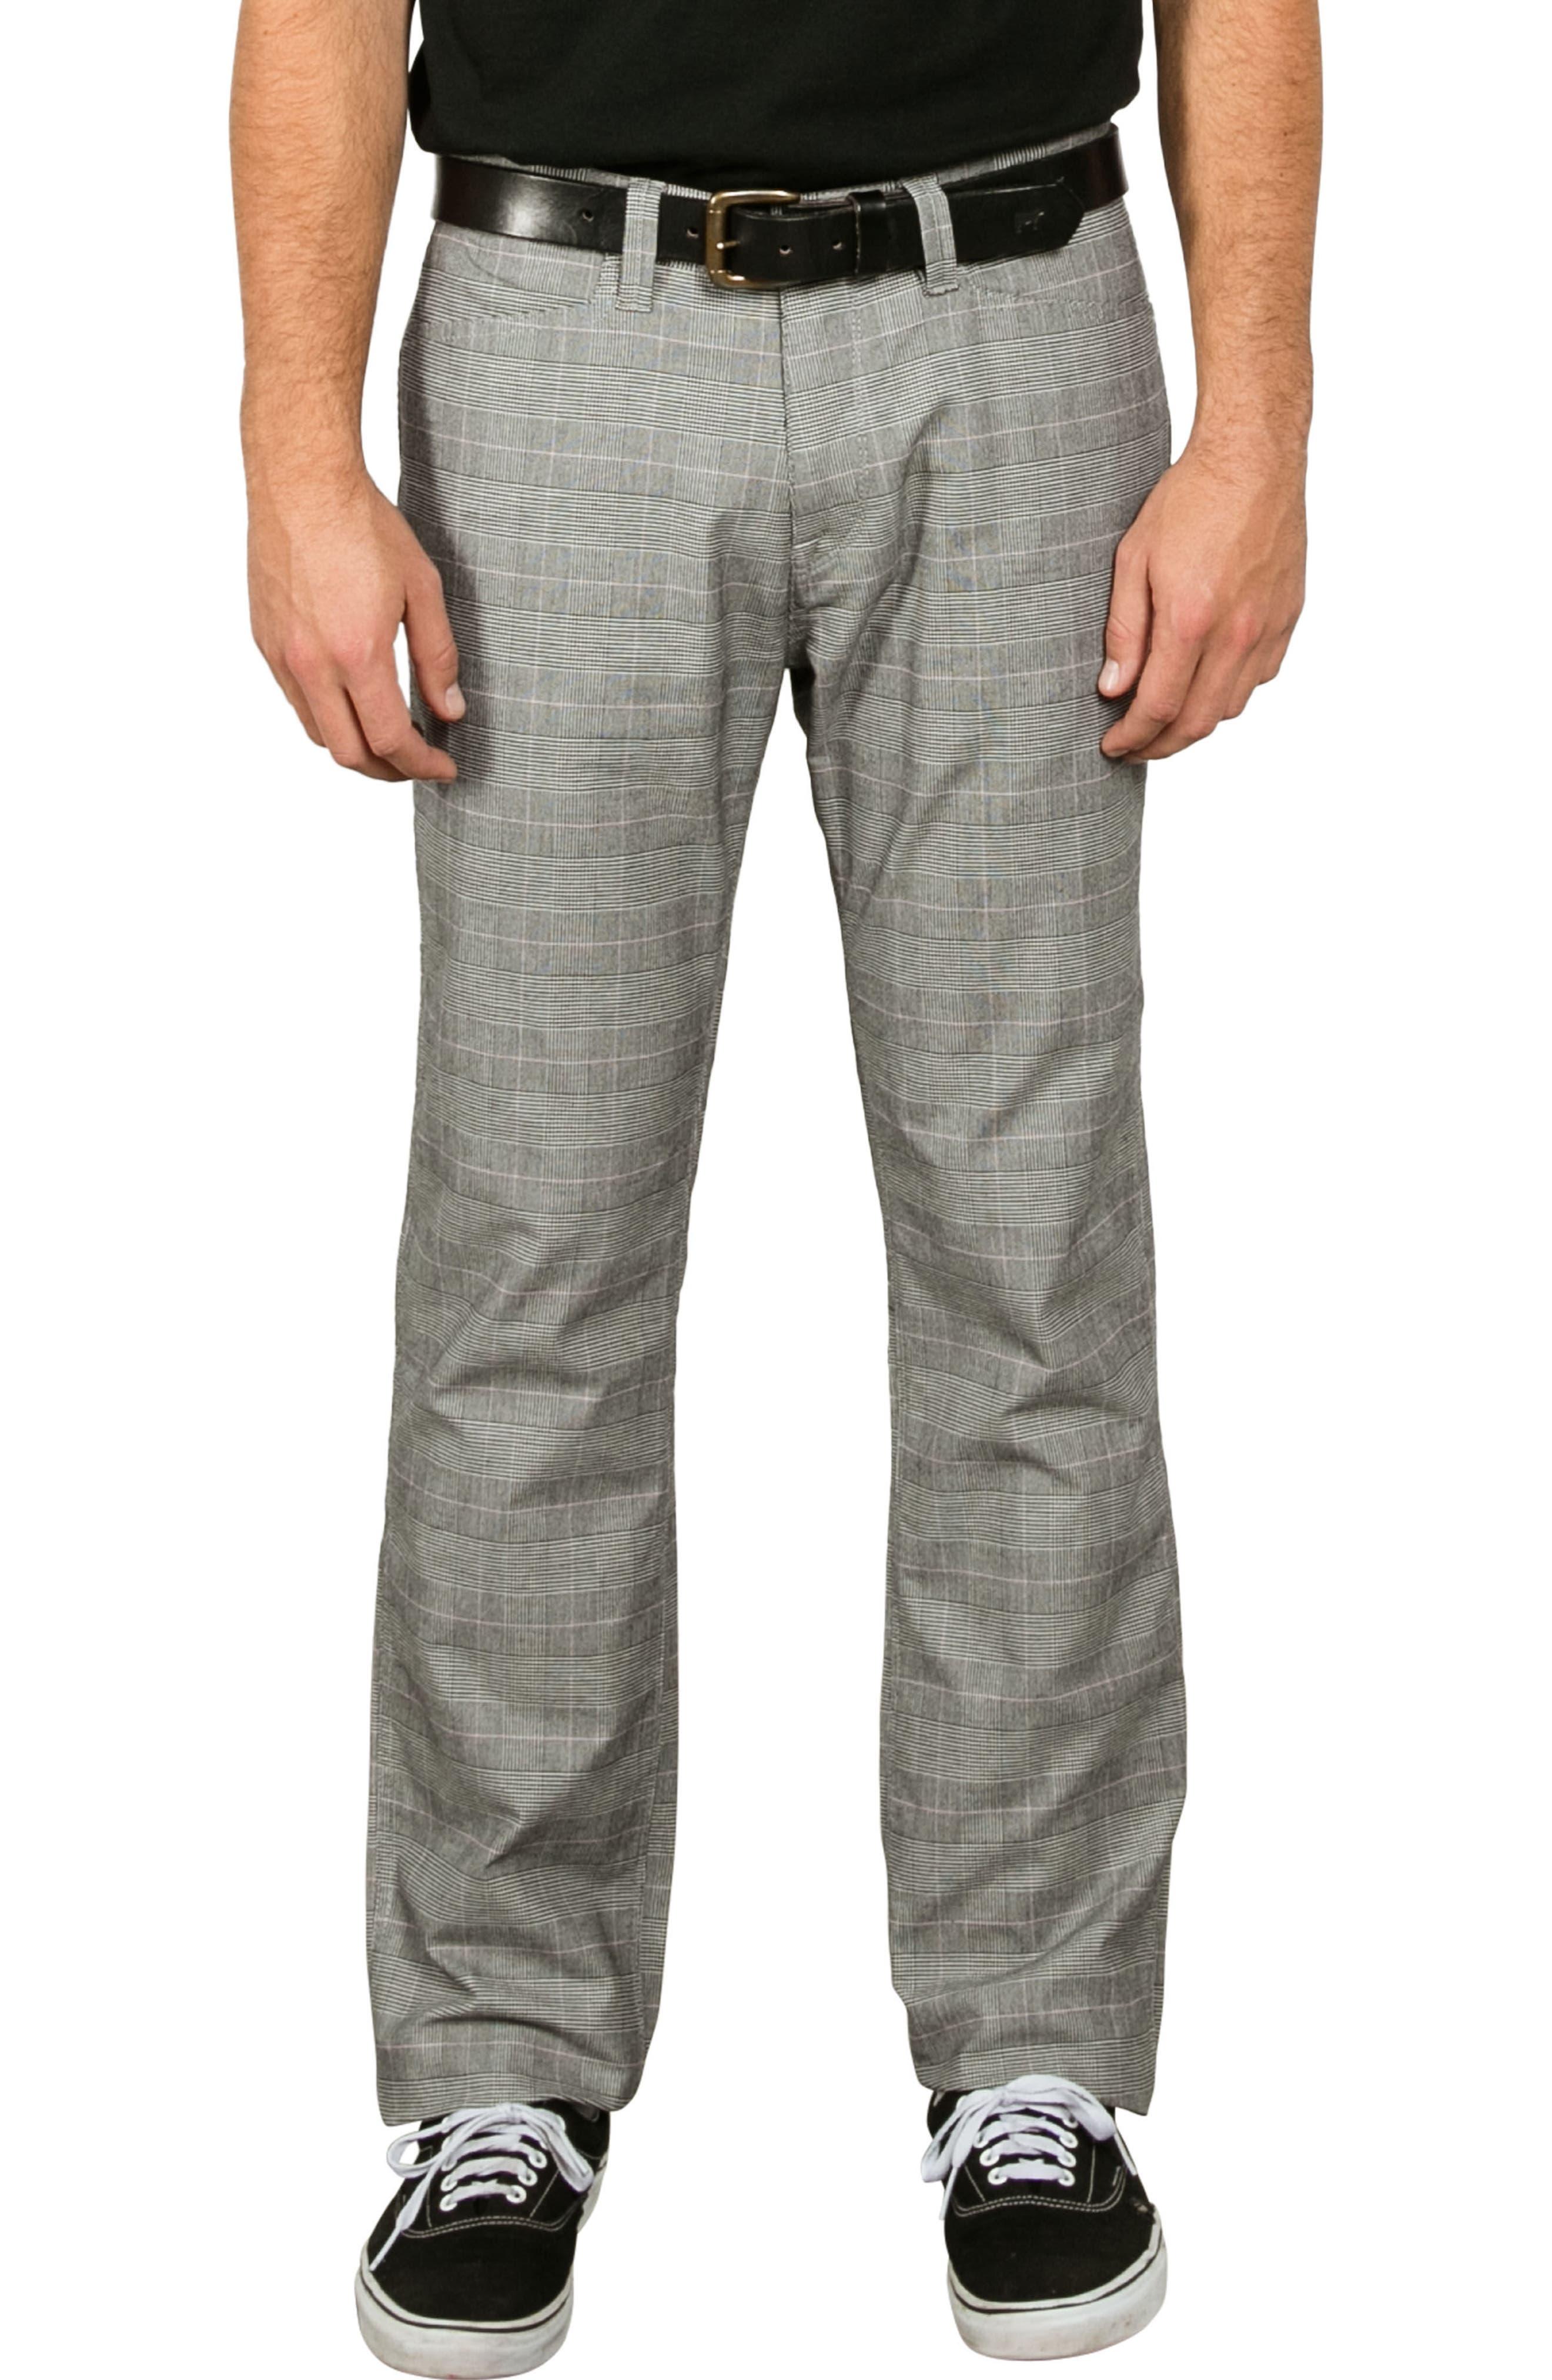 Gritter Modern Thrifter Pants,                             Main thumbnail 2, color,